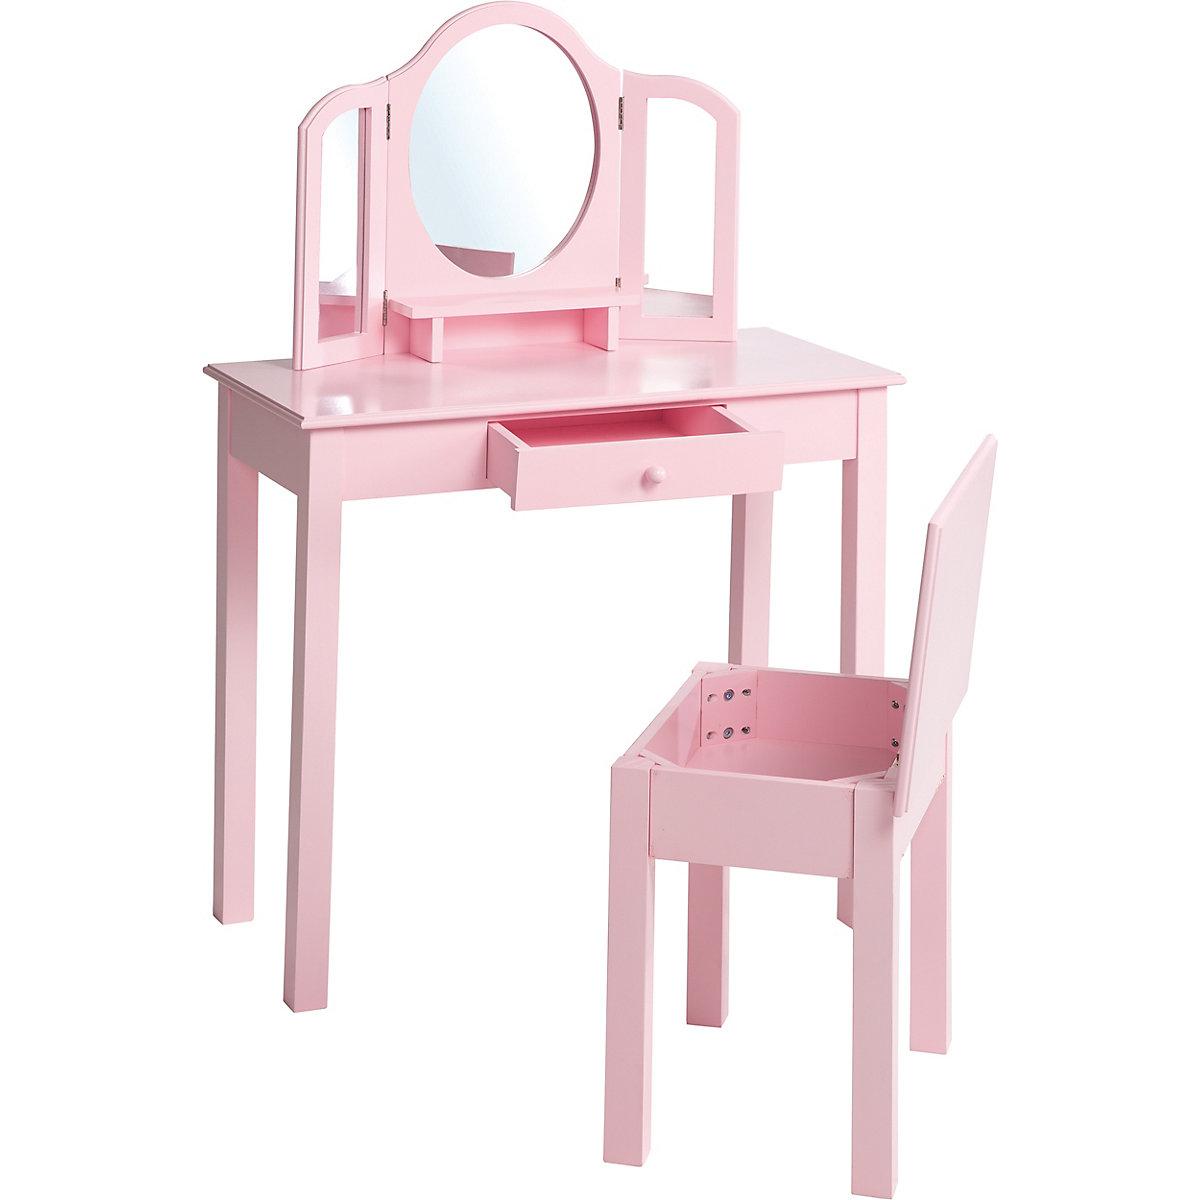 schminktisch mit hocker rosa lackiert roba mytoys. Black Bedroom Furniture Sets. Home Design Ideas